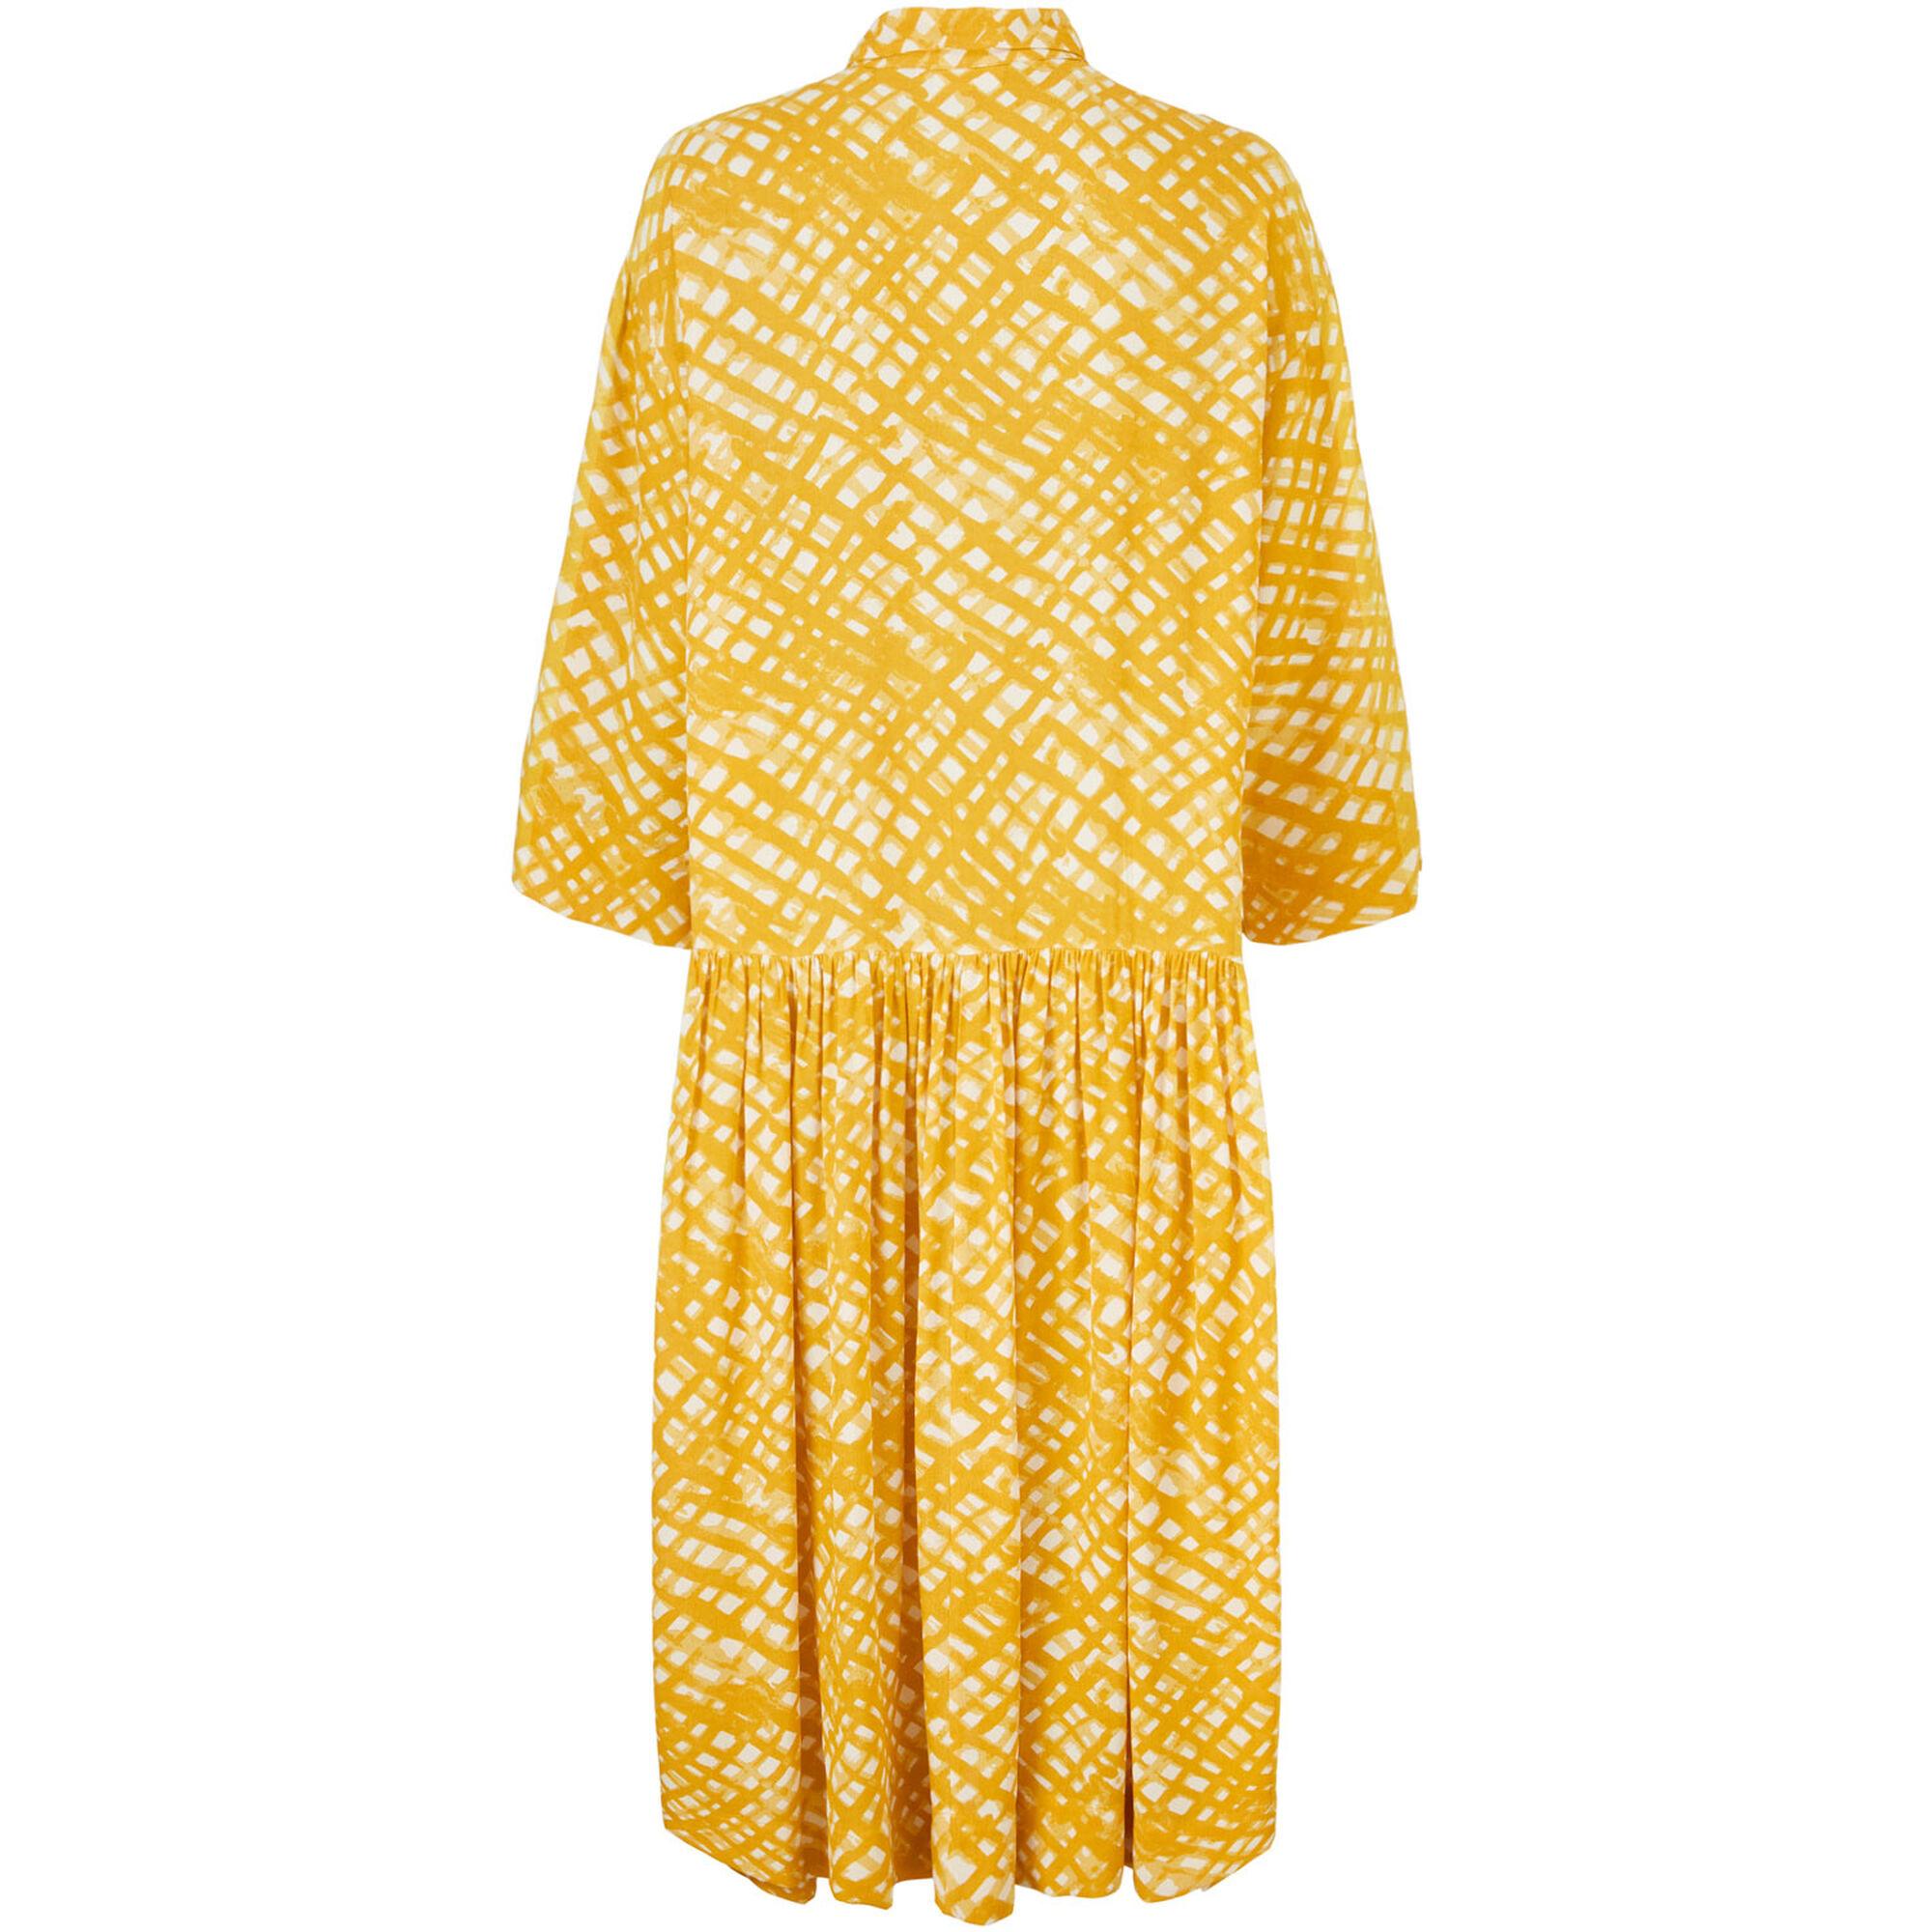 NANETTI DRESS, Sauterne, hi-res